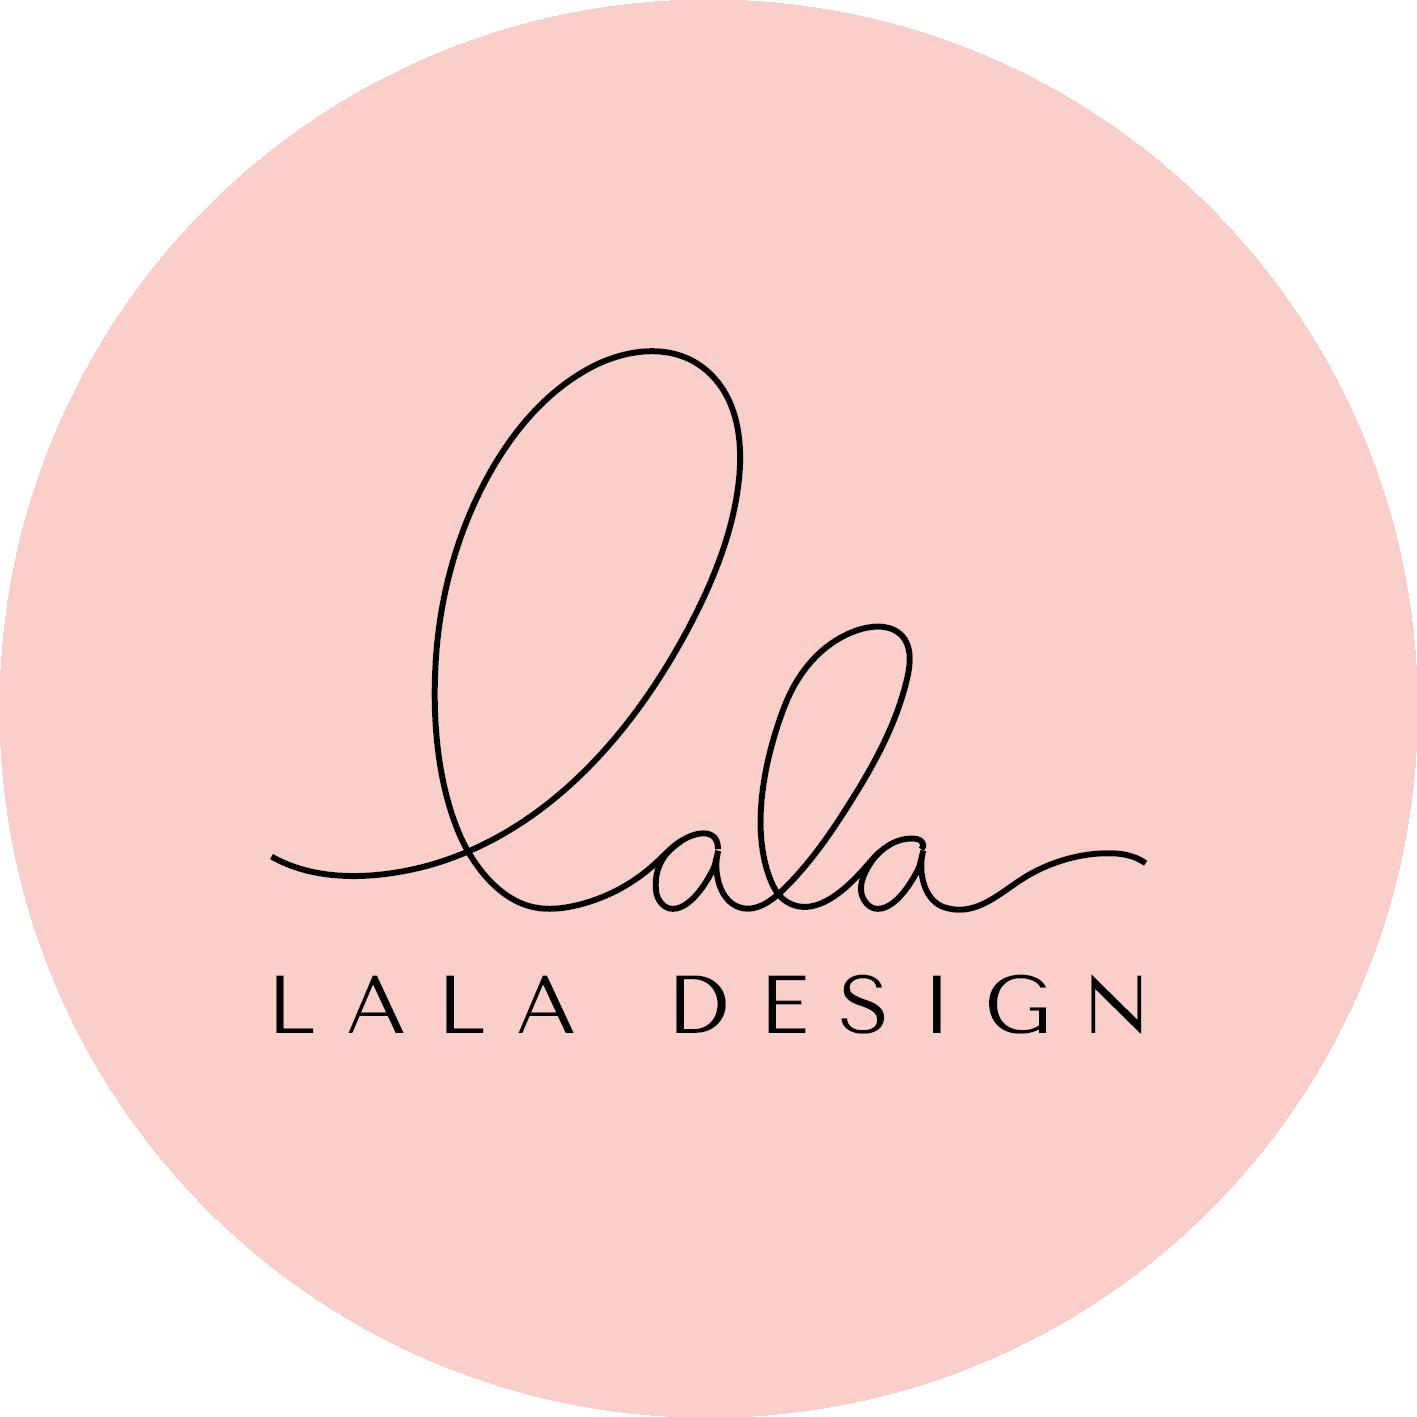 ROUND-LALA DESIGN JUNE 2019 LOGO